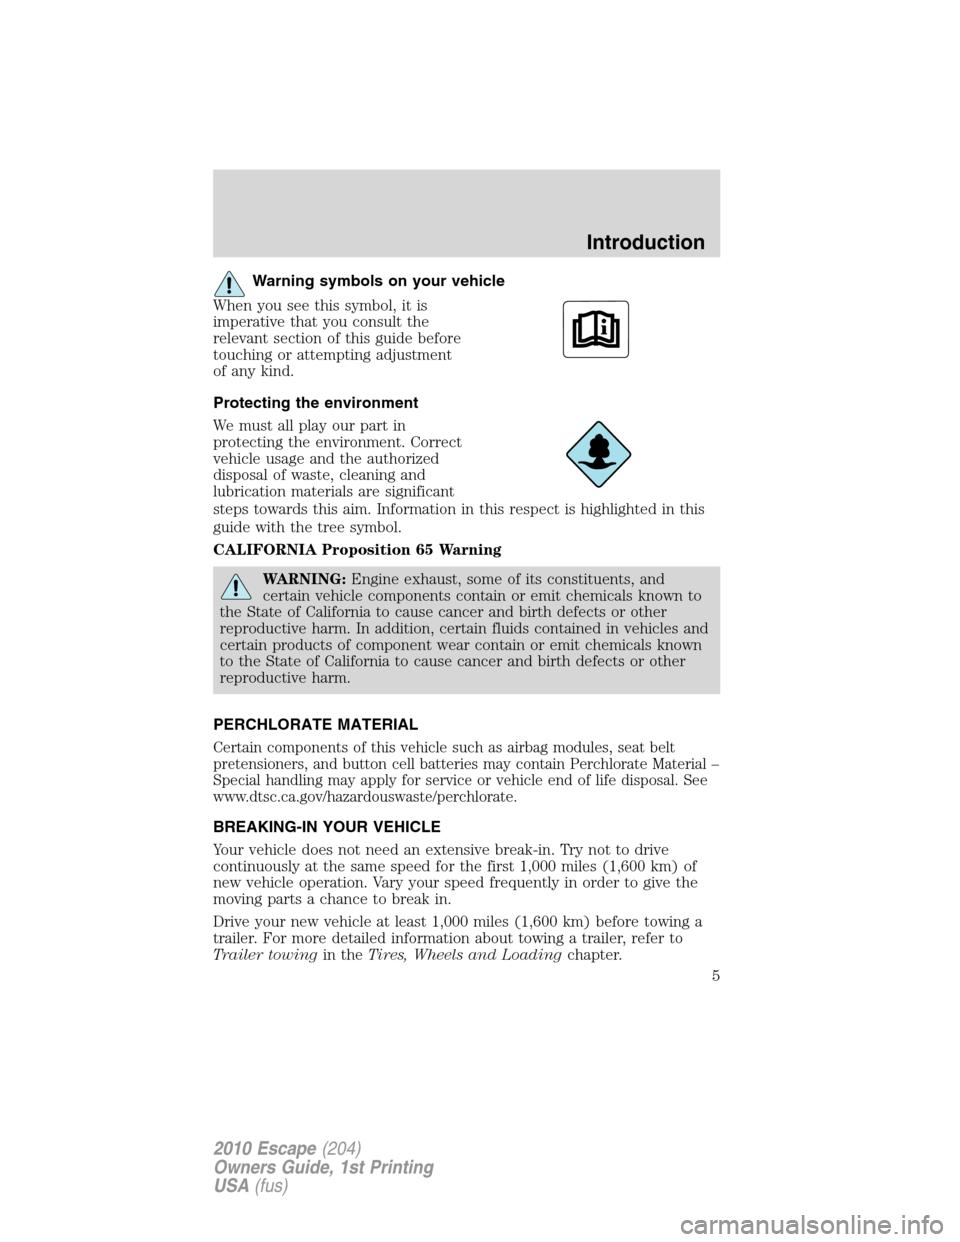 ford escape 2010 2 g owners manual. Black Bedroom Furniture Sets. Home Design Ideas